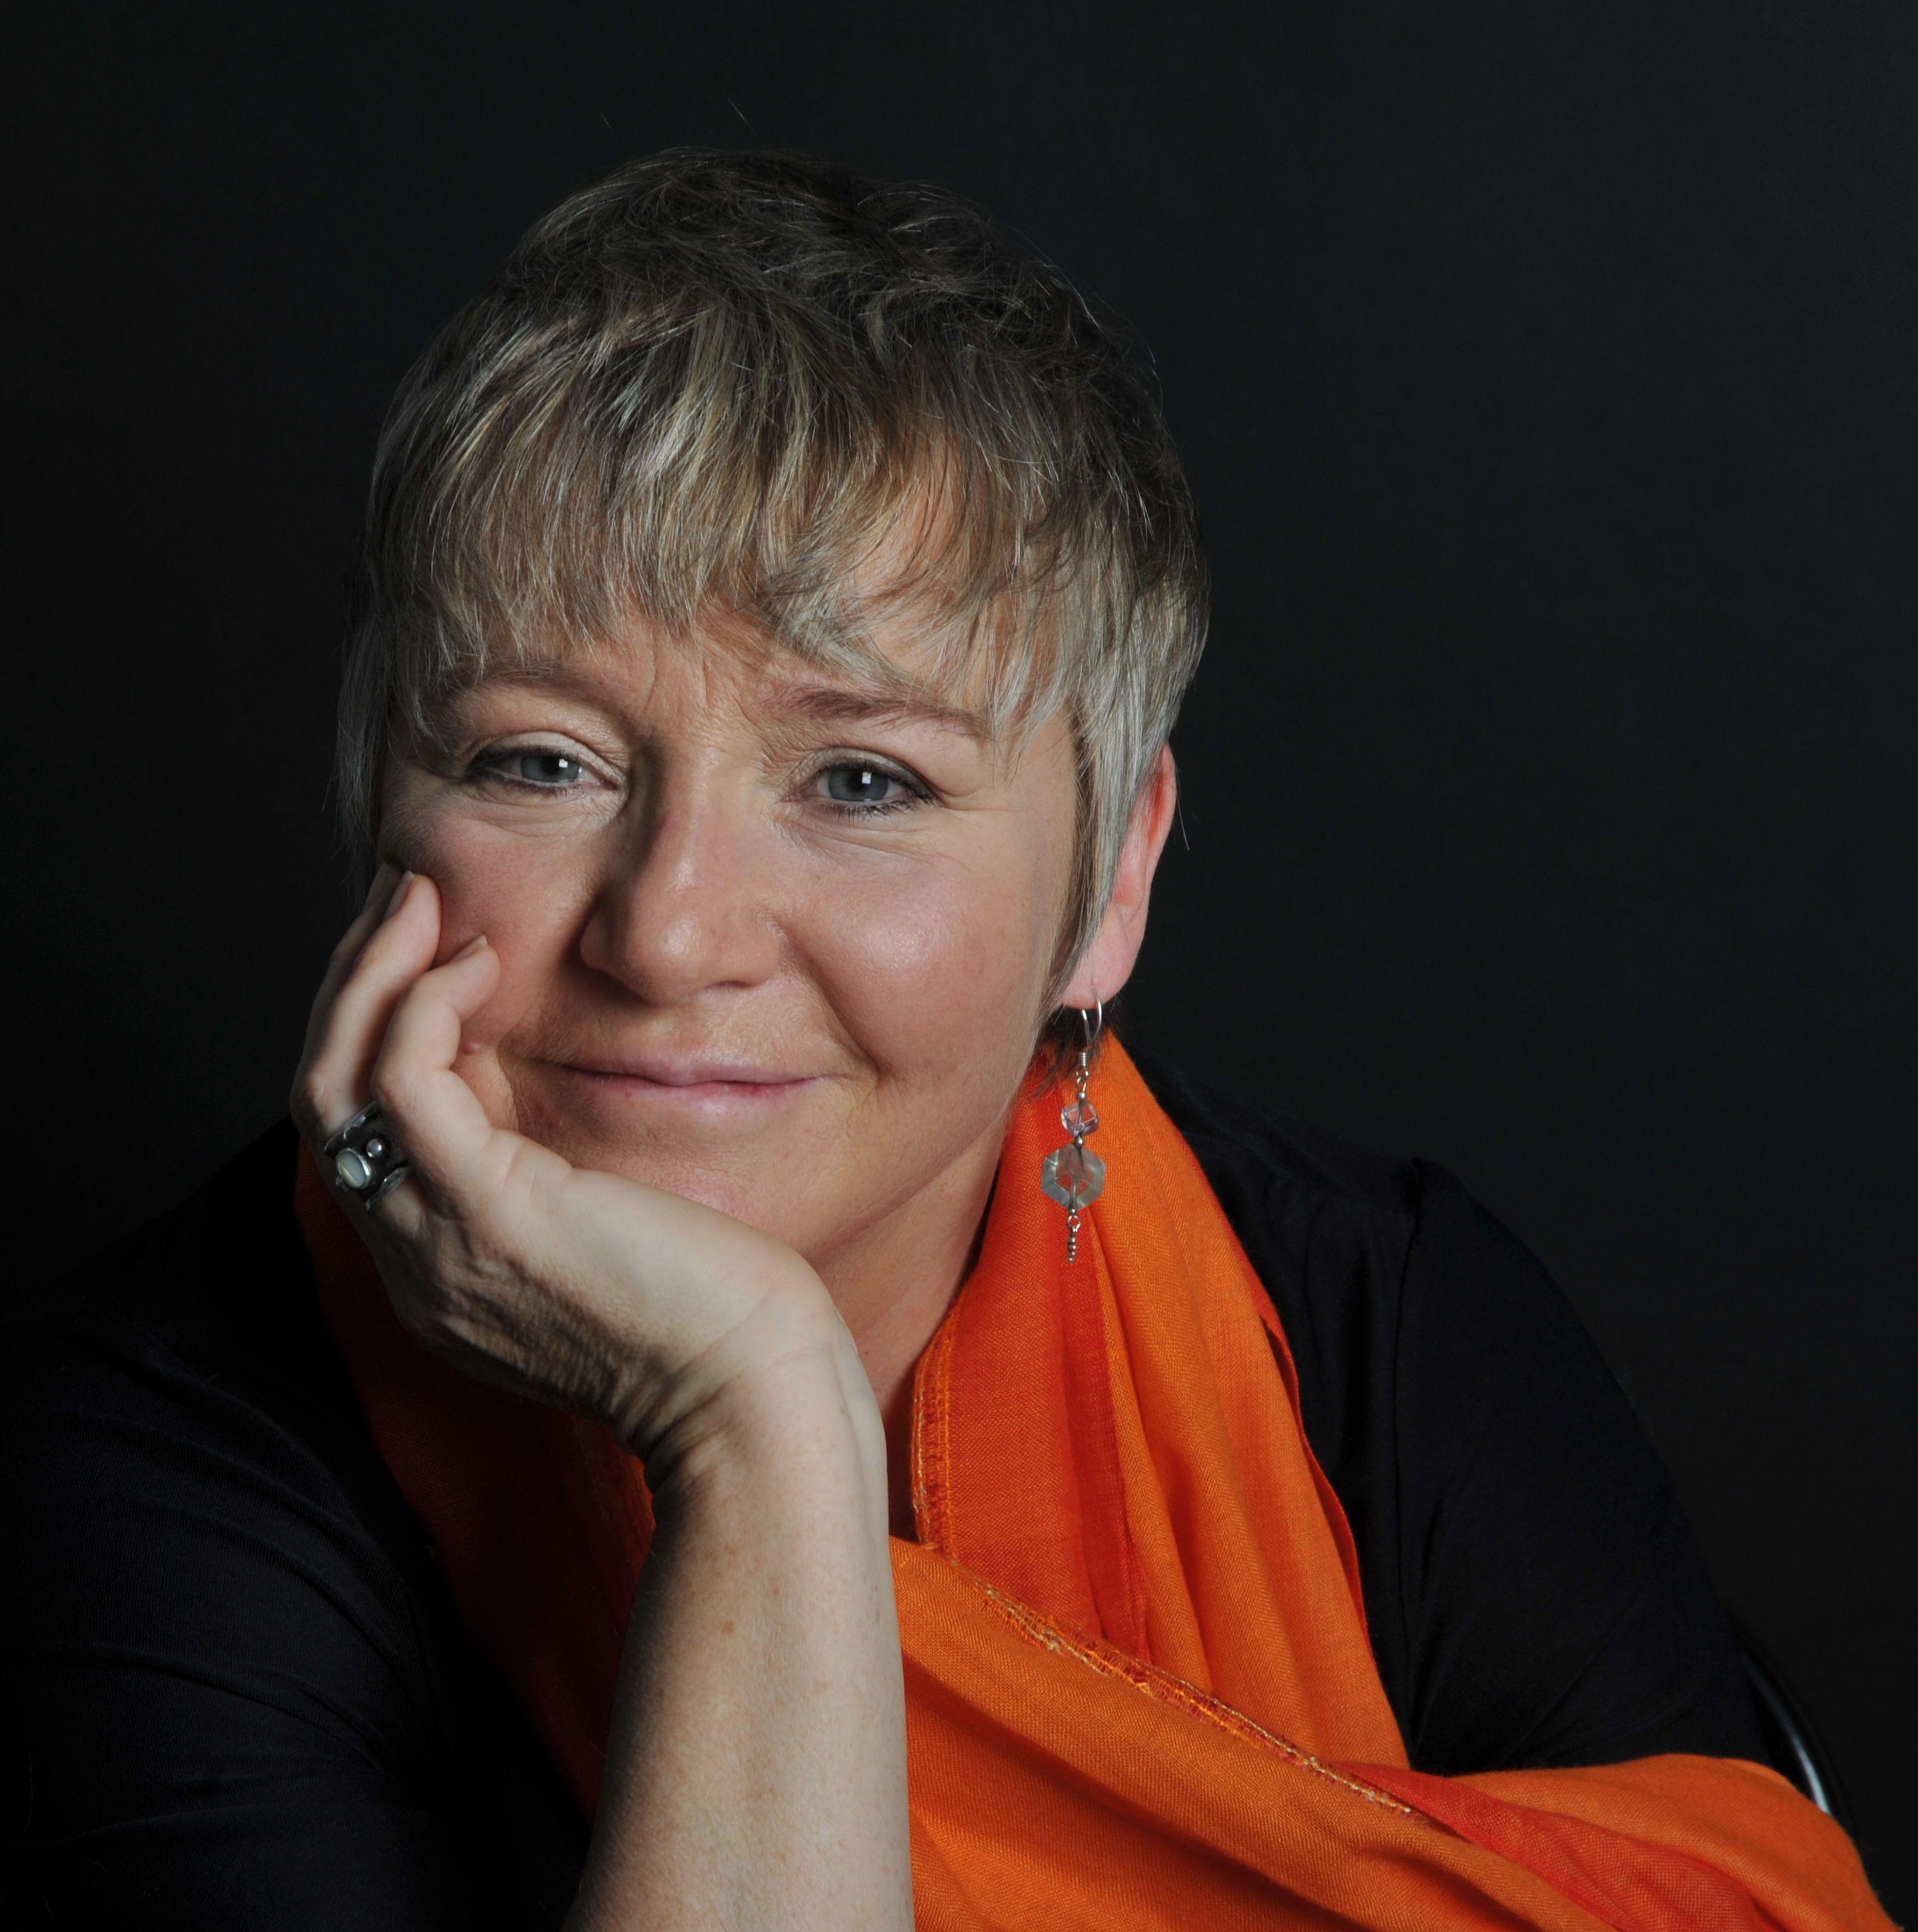 Wendy Ellyatt